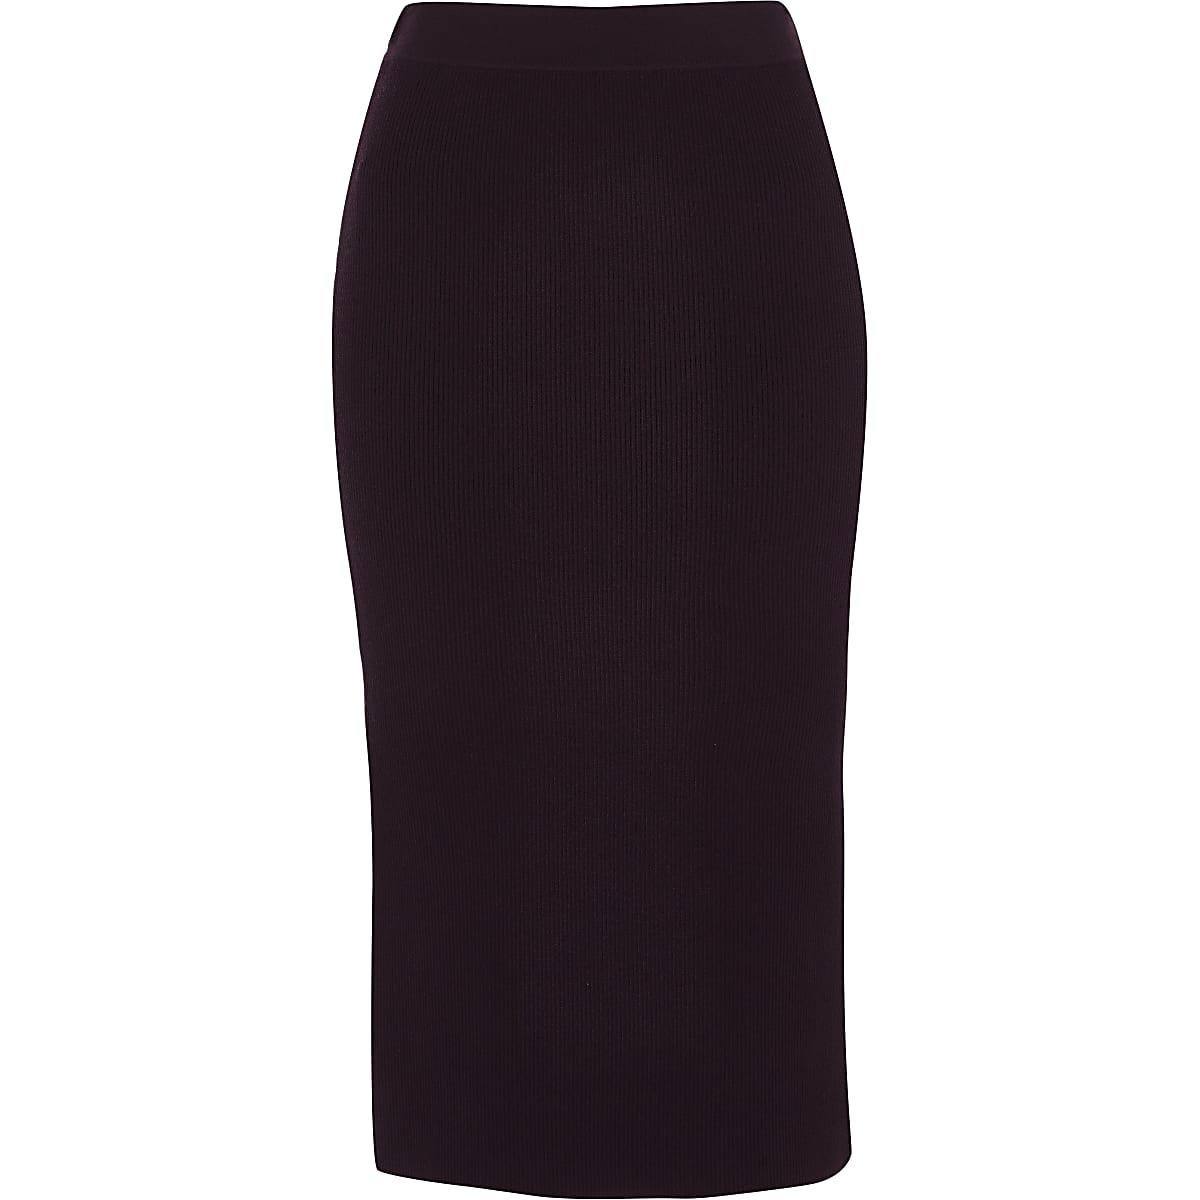 Purple ribbed pencil skirt